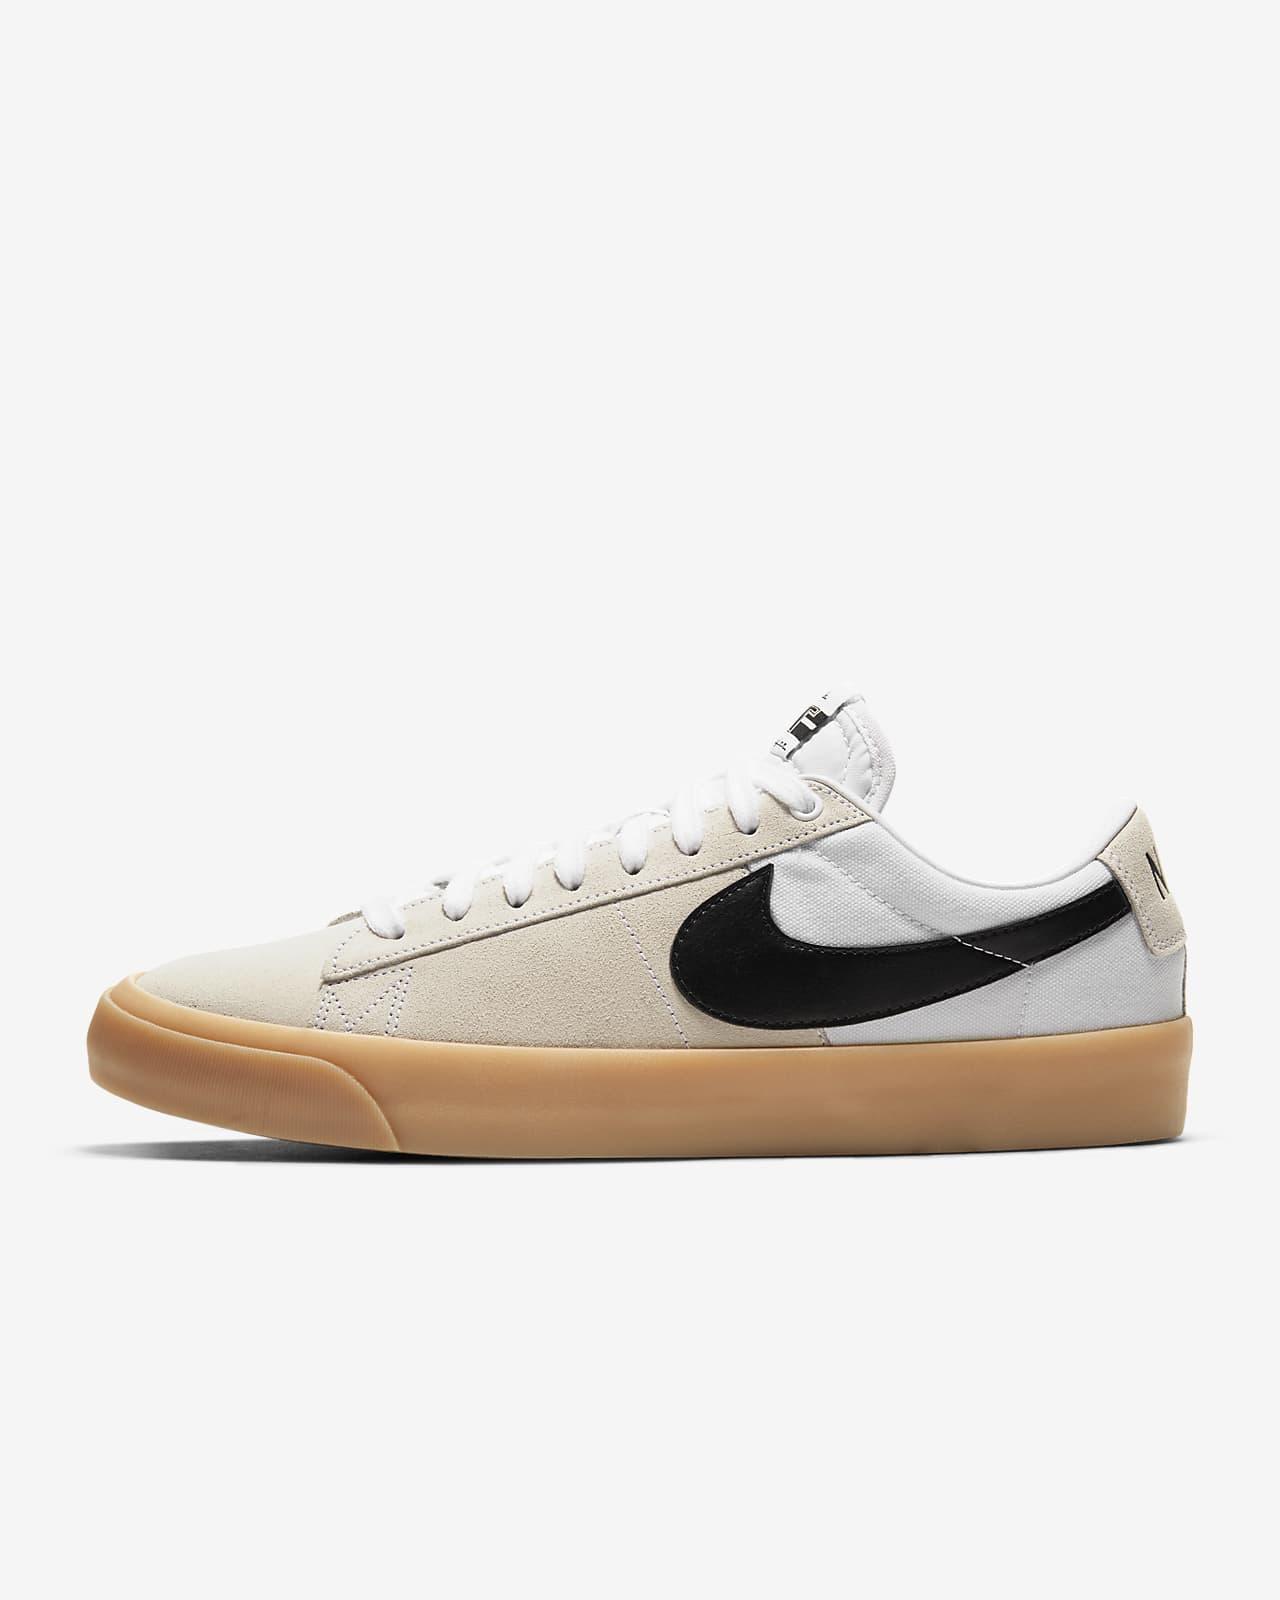 Nike SB Zoom Blazer Low Pro GT Skate Shoe. Nike LU